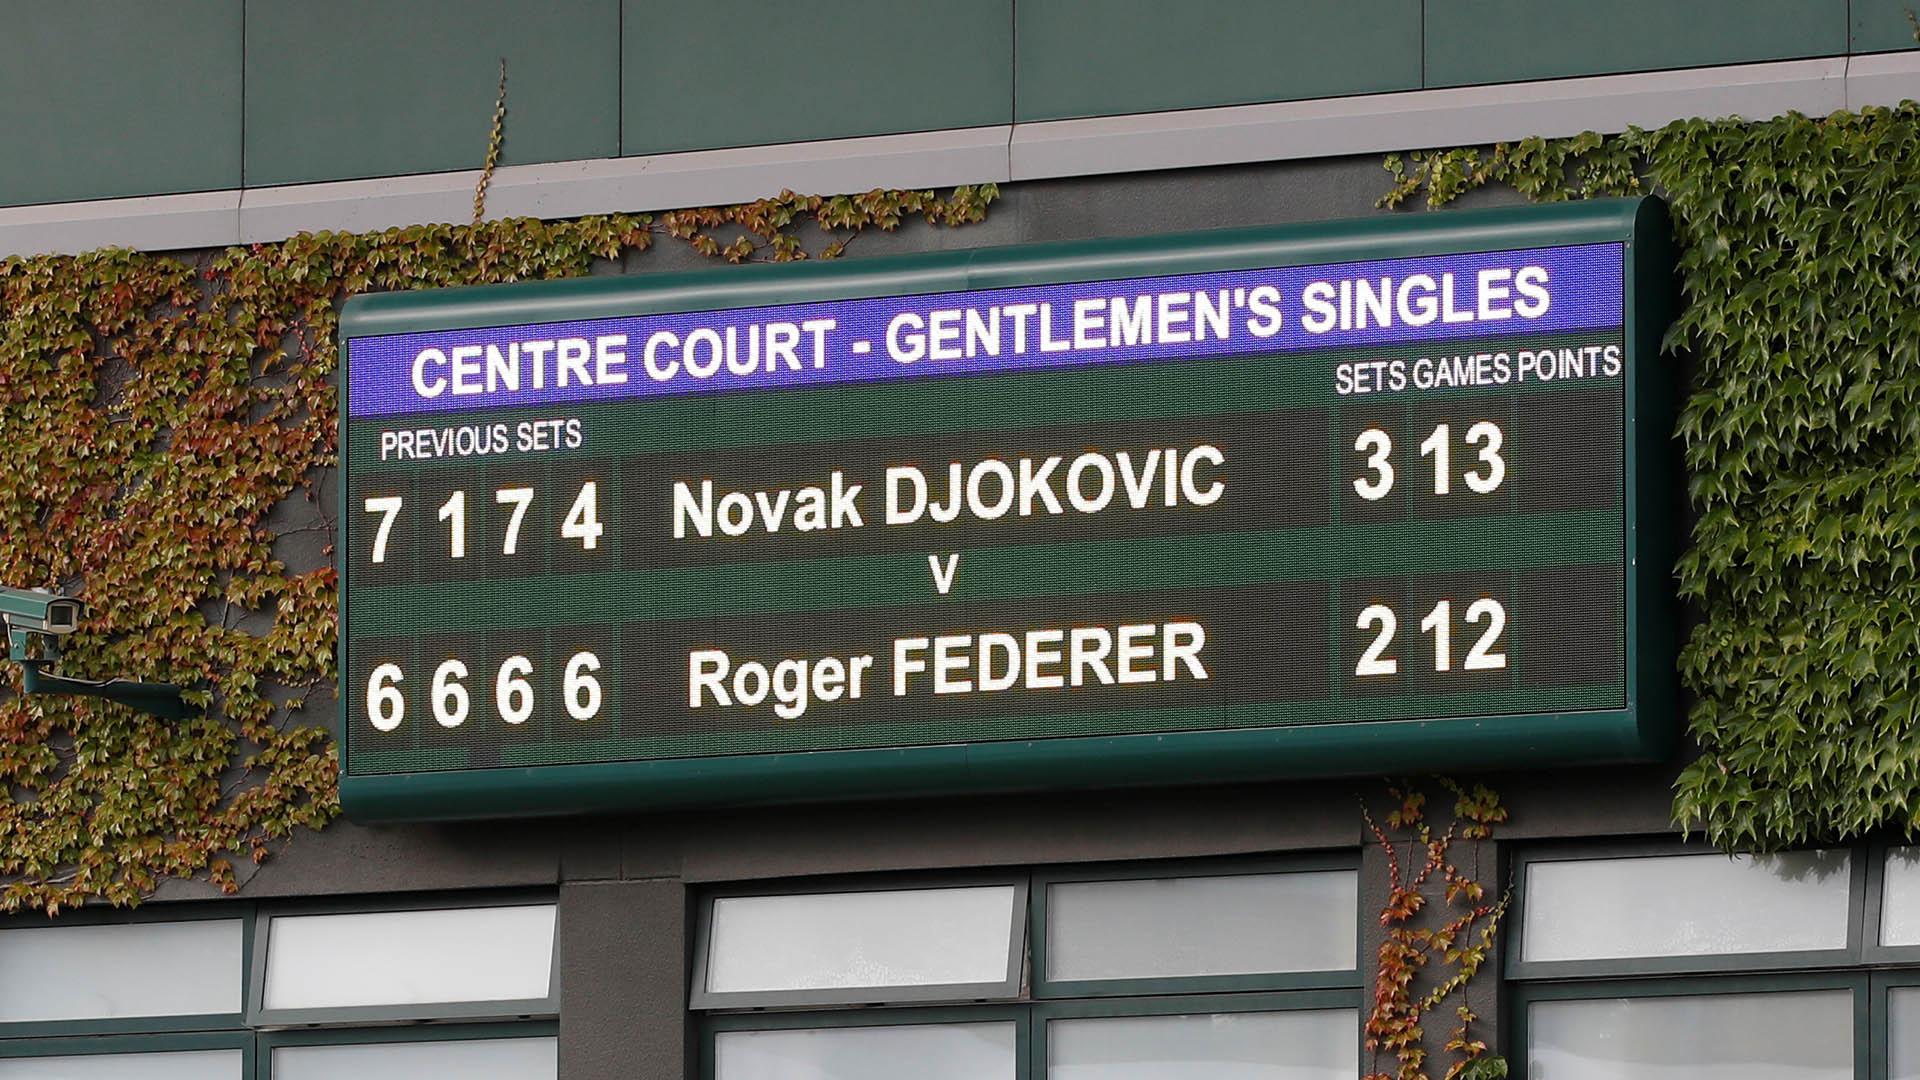 Fue la final más larga de la historia de Wimbledon: duró 4 horas y 57 minutos (REUTERS)